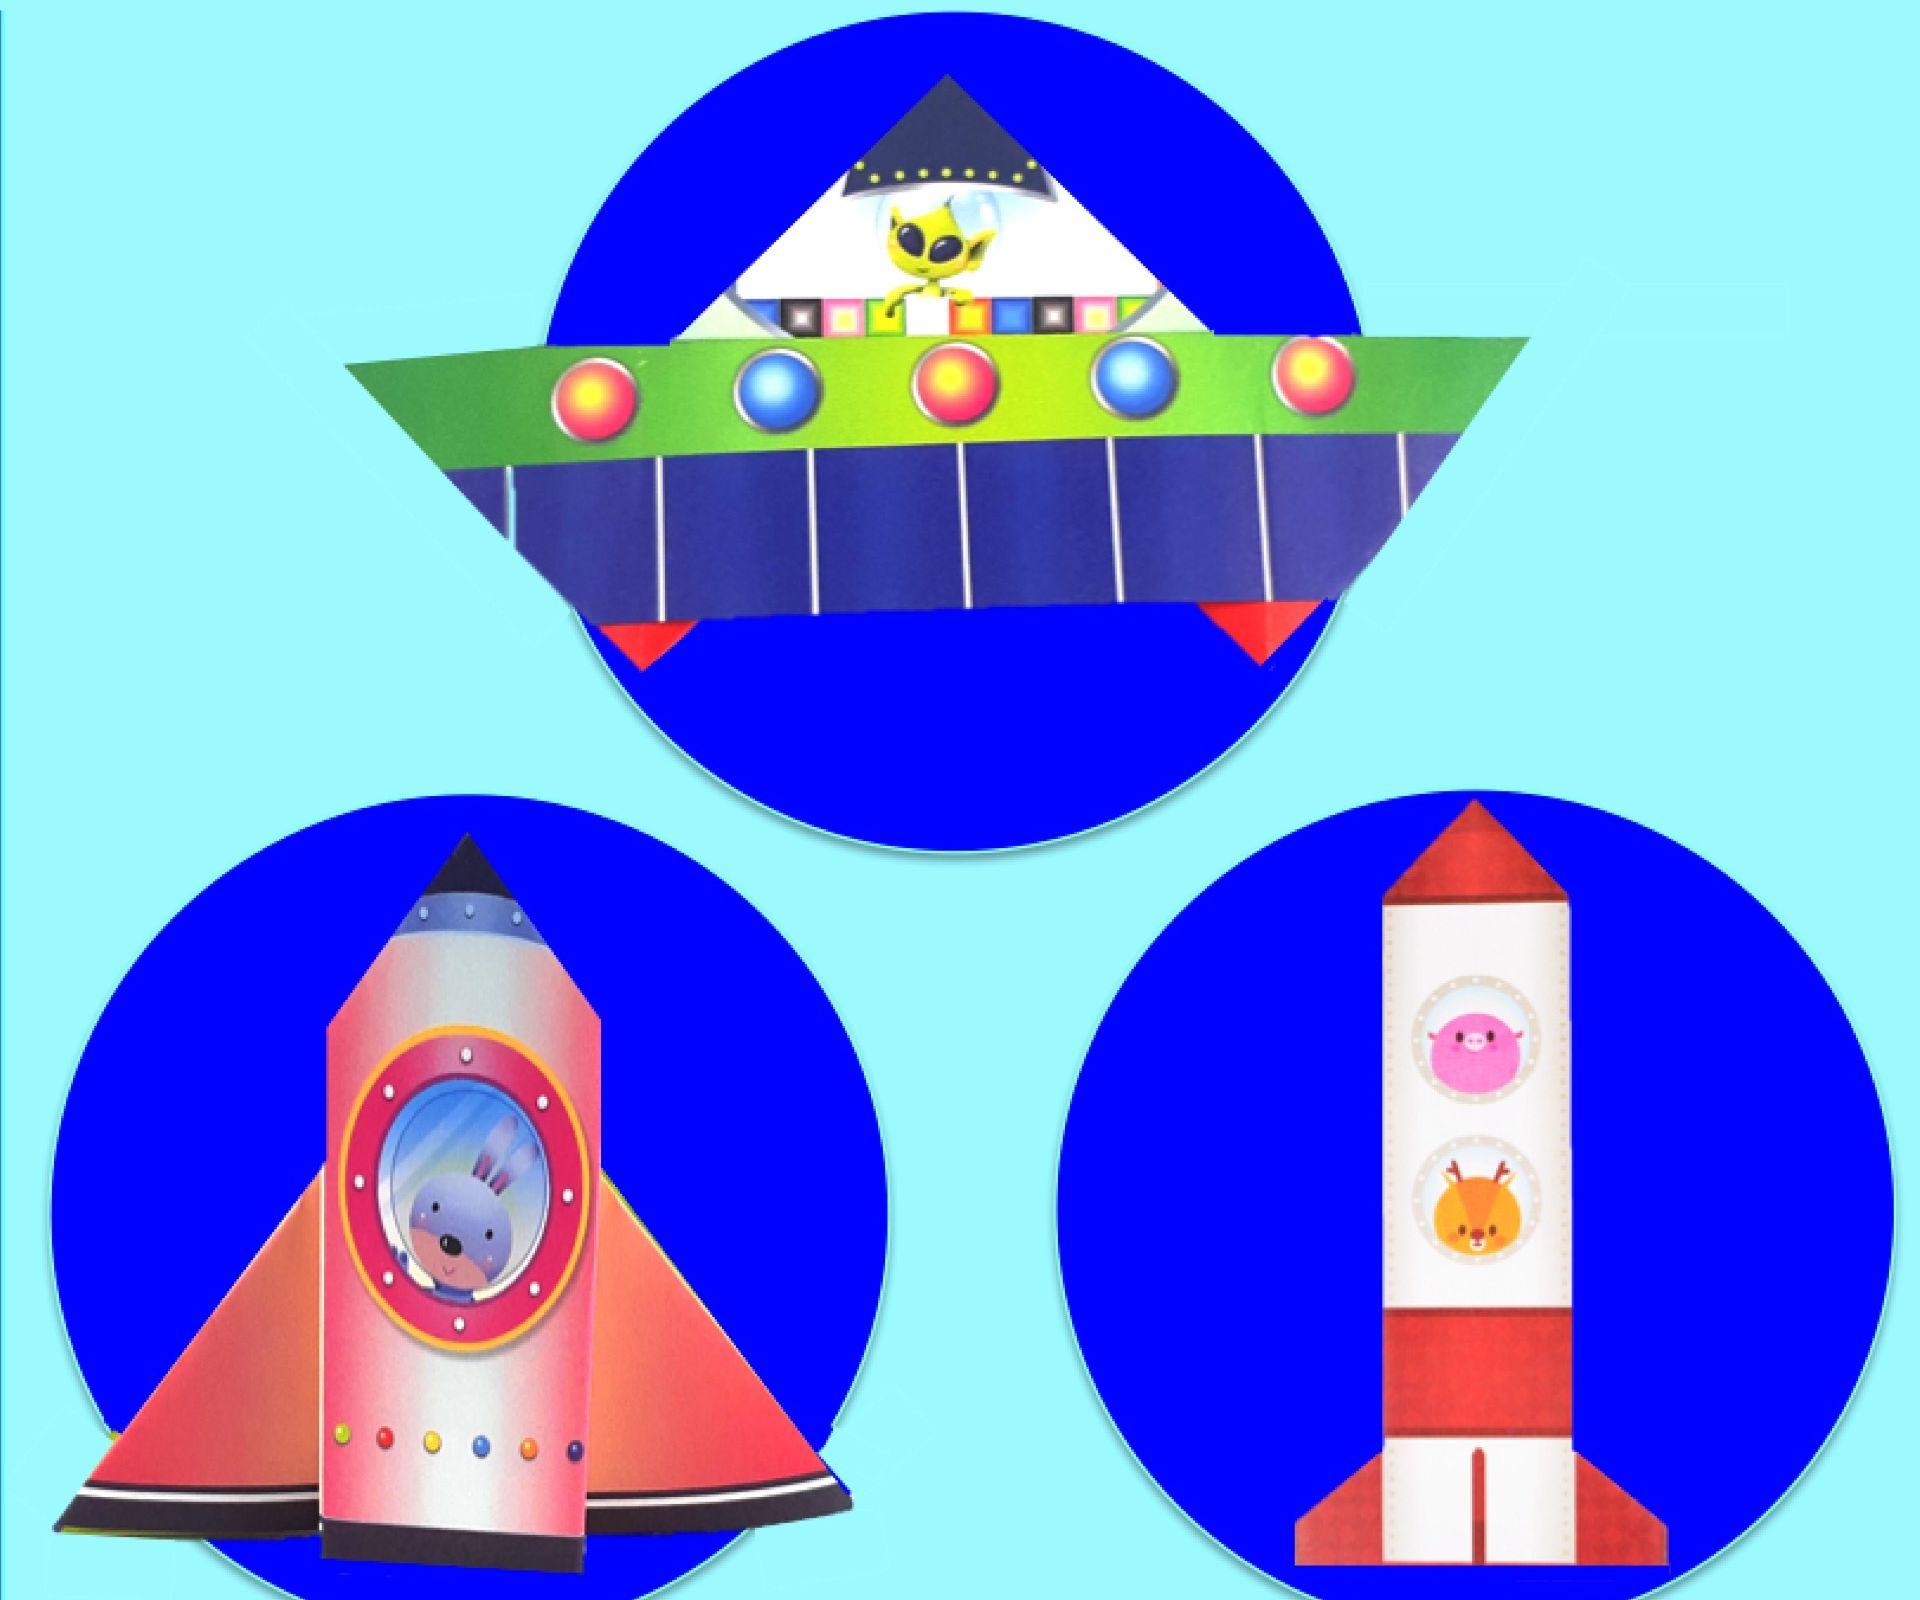 Origami / Paper Craft UFO & Space Shuttles